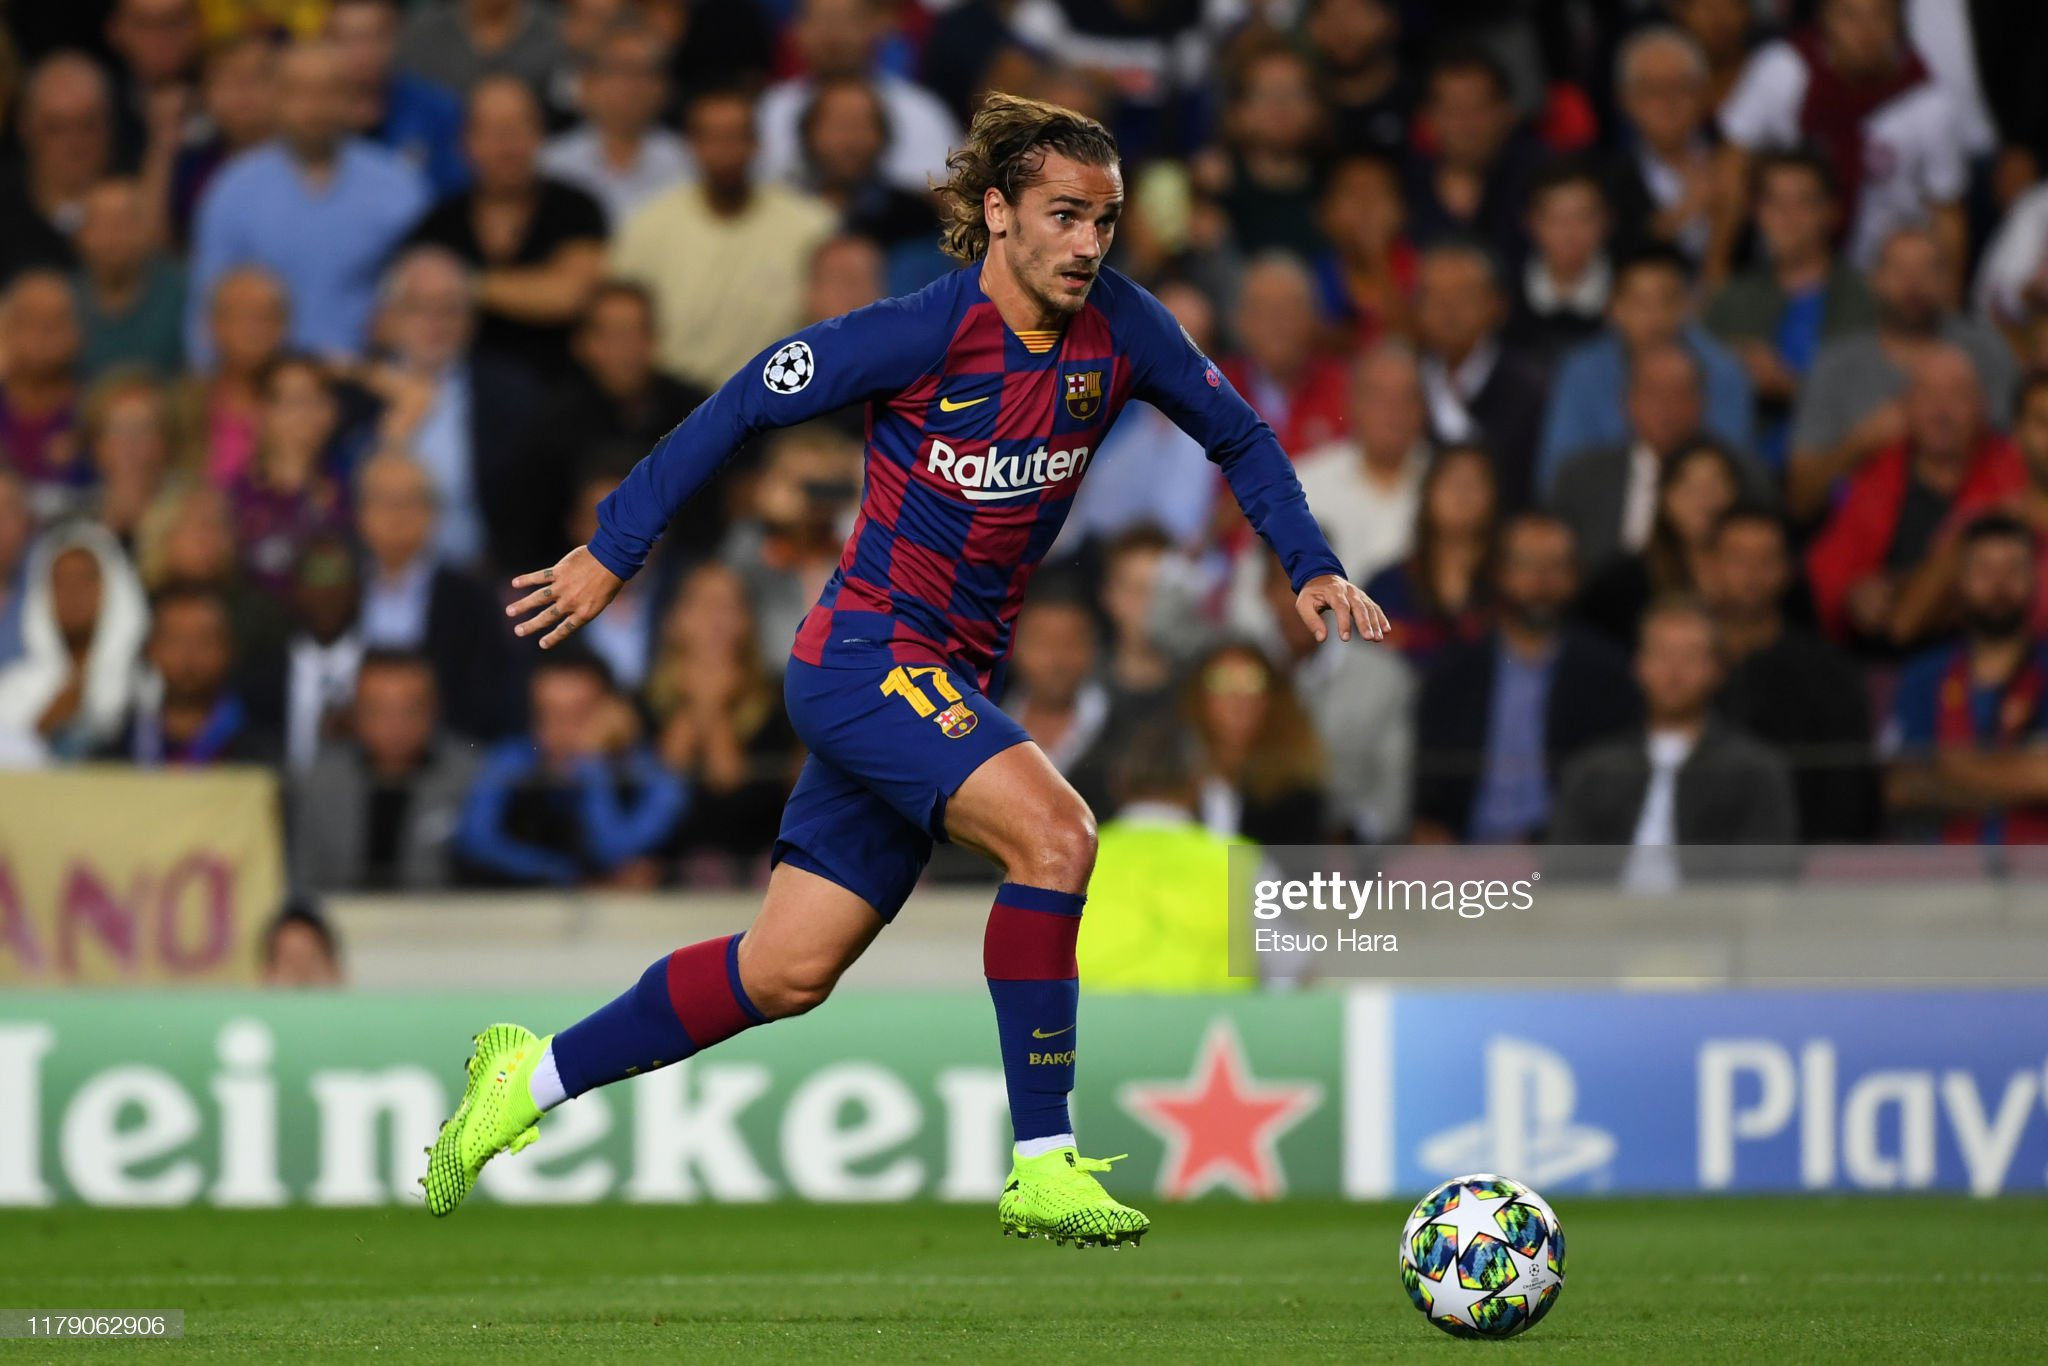 صور مباراة : برشلونة - إنتر 2-1 ( 02-10-2019 )  Antoine-griezmann-of-fc-barcelona-in-action-during-the-uefa-champions-picture-id1179062906?s=2048x2048